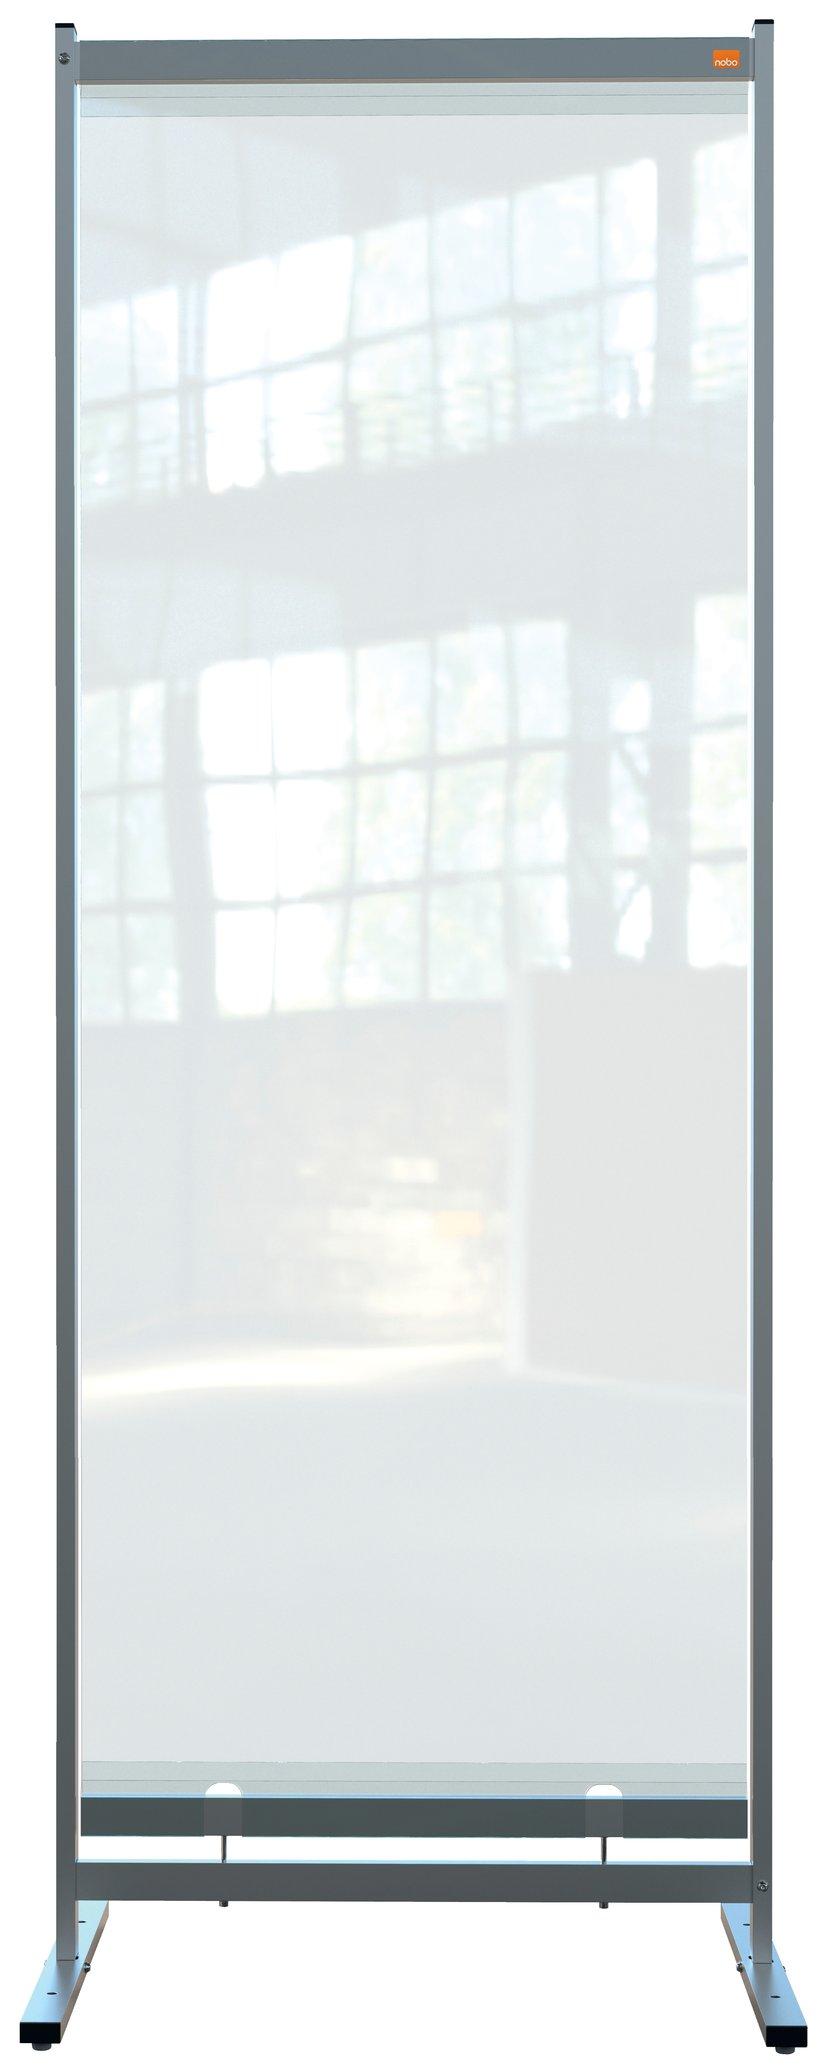 Nobo Gulv Væg PVC Film Medium 78x206cm